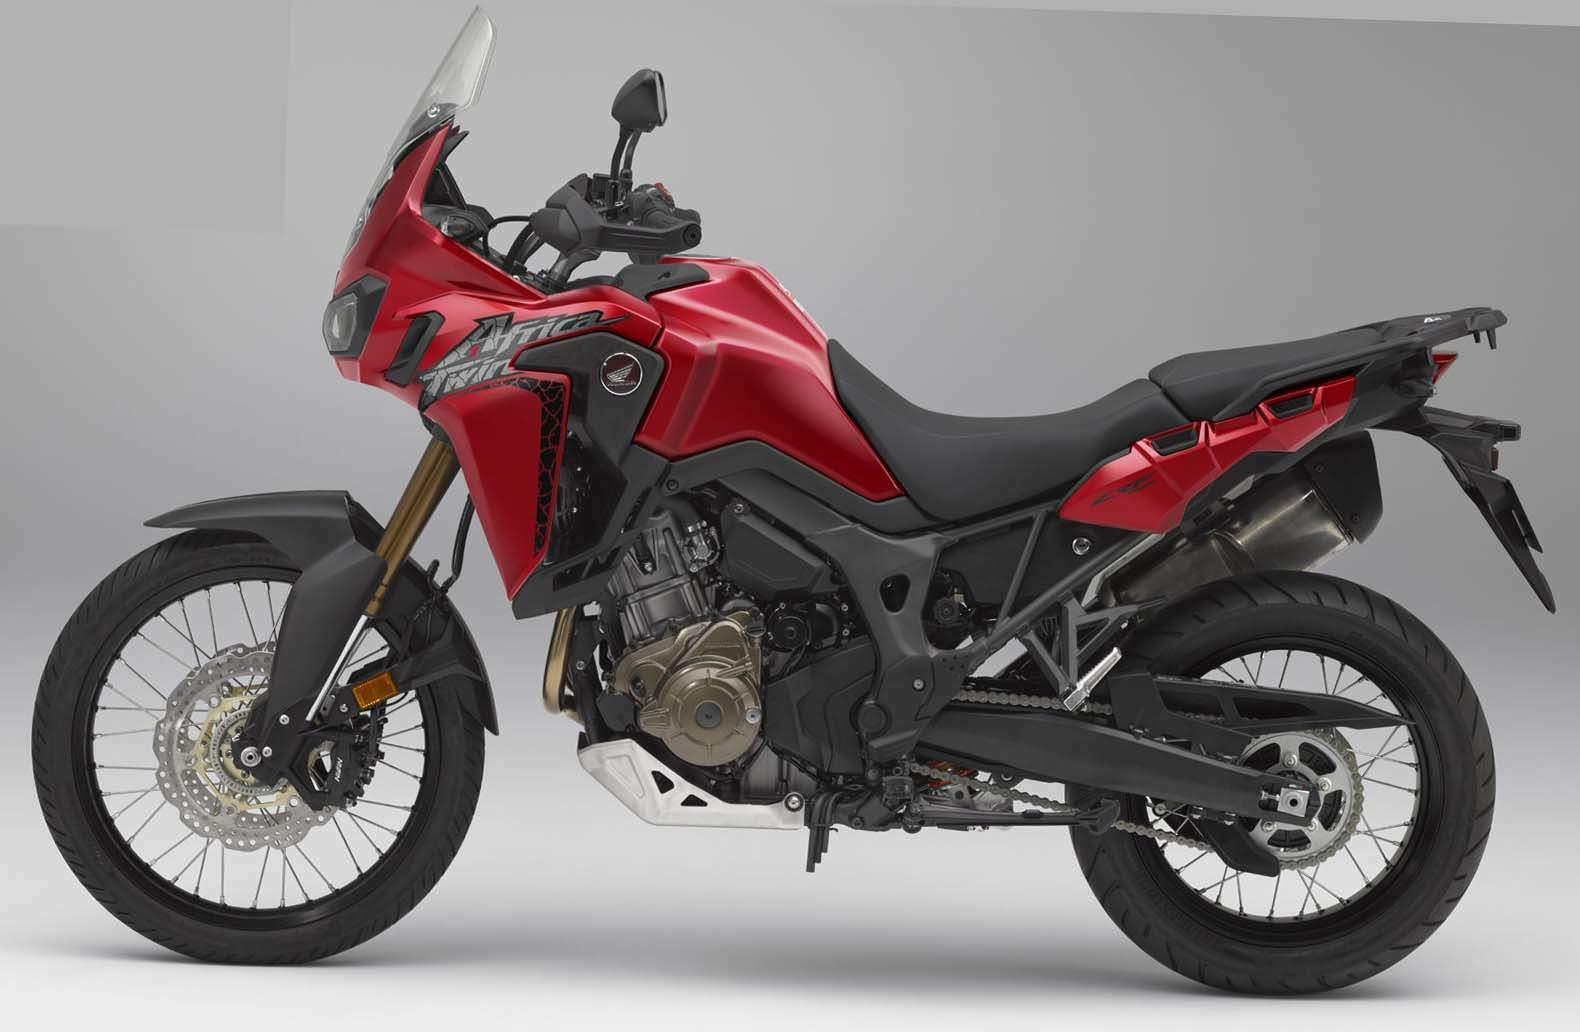 Ducati Scrambler 1100 Special Vs Honda Africa Twin 1000 Dct Compare Adventure Motorcycle Spec S